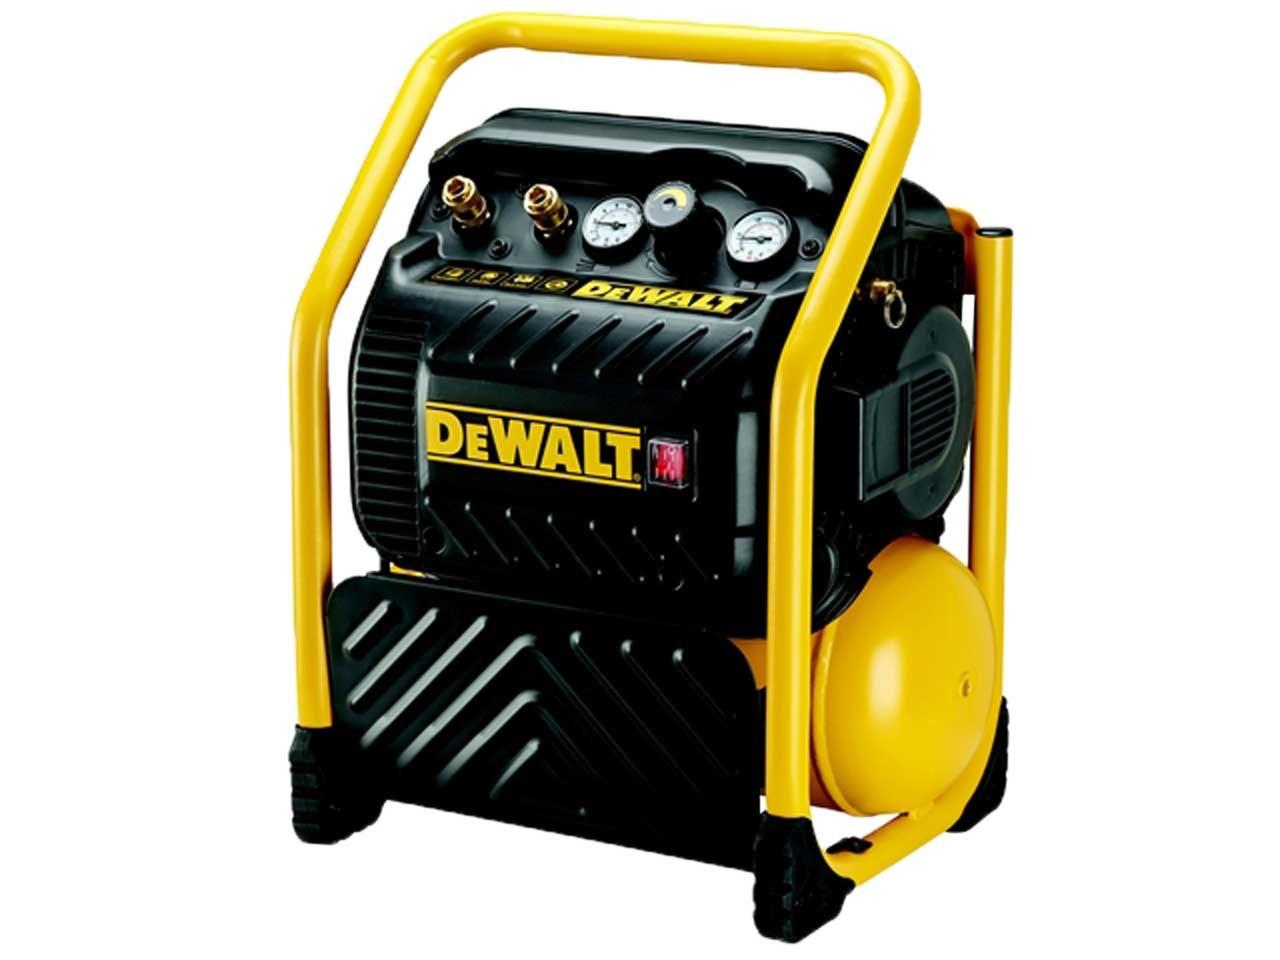 dewalt compressor. dewalt compressor